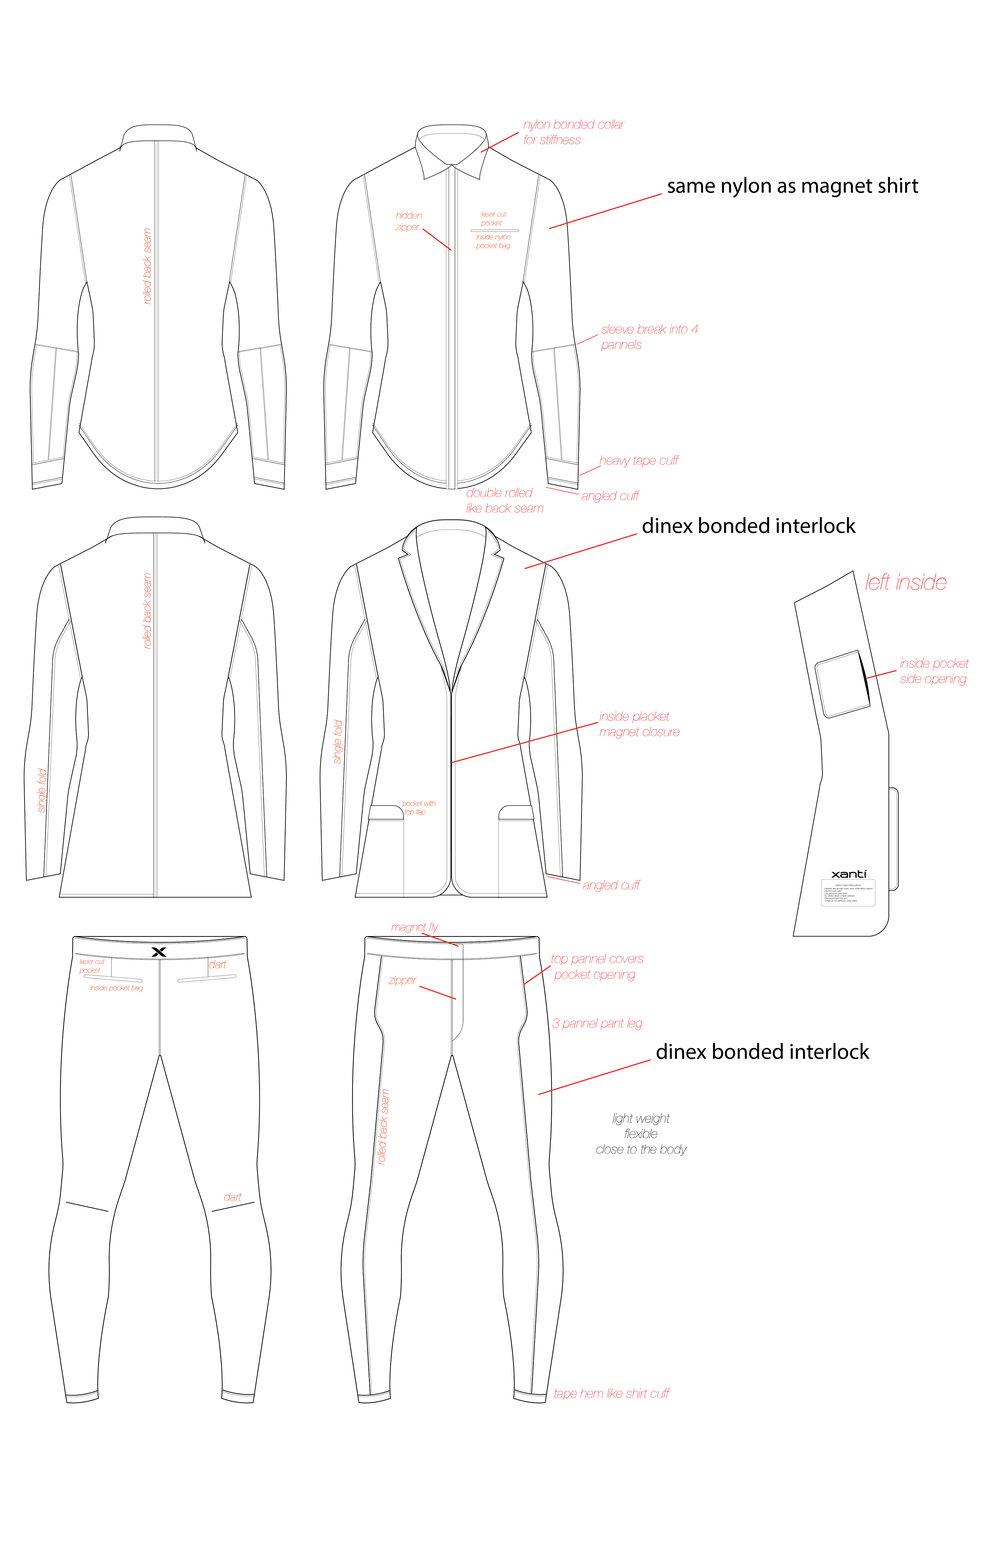 xanti suit 1 detail-01.jpg